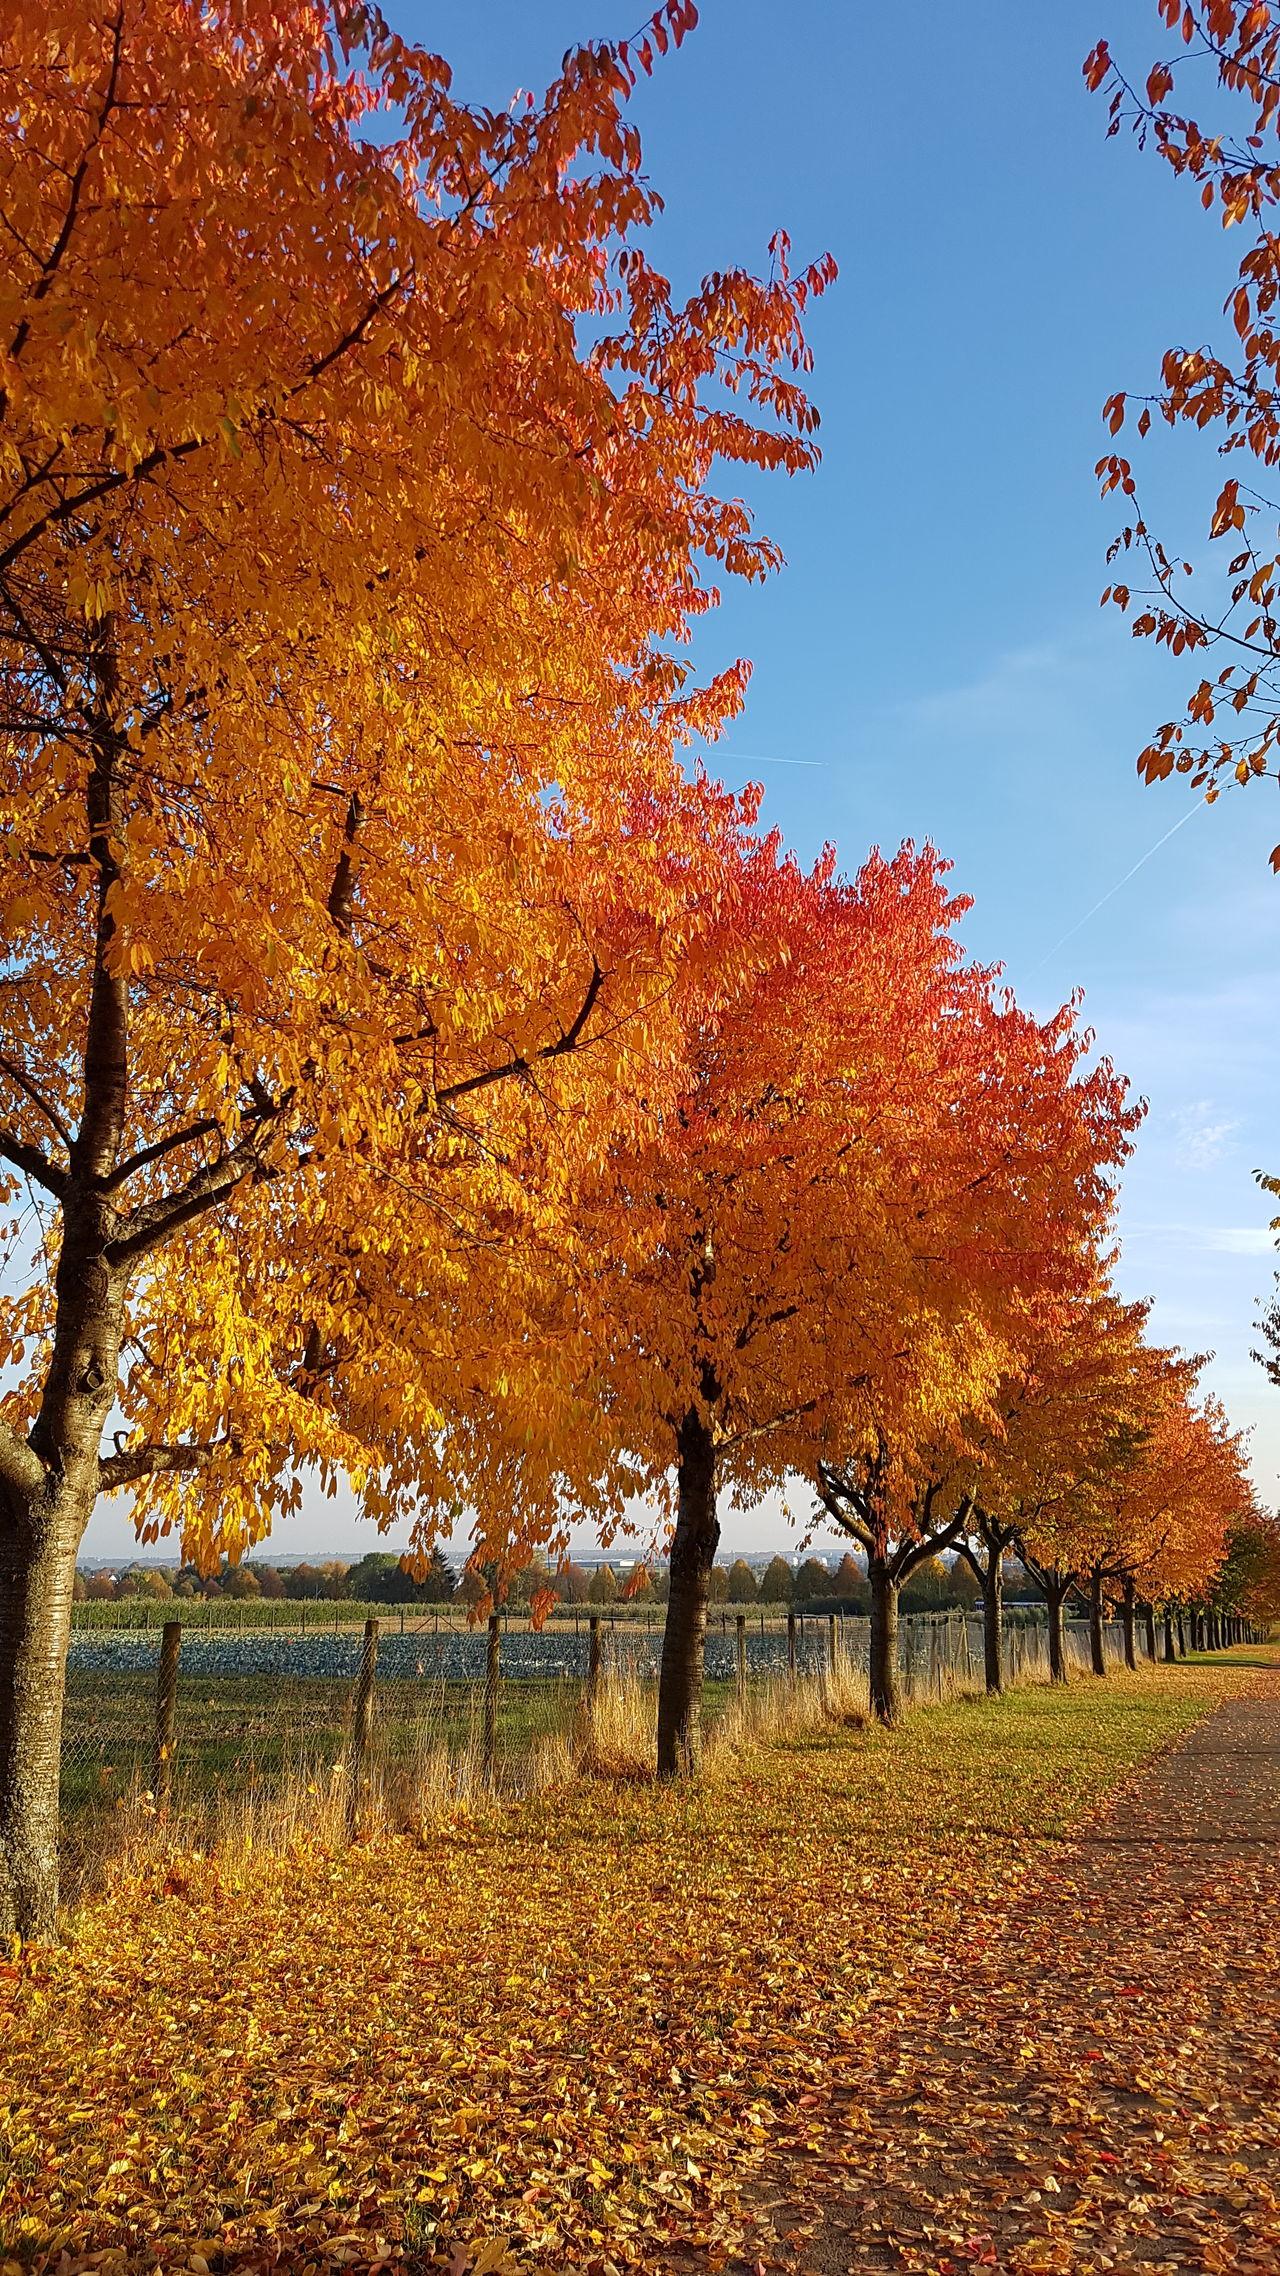 Autumn Autumn Colors Autumn Leaves Autumn🍁🍁🍁 Autumn Collection Autumn 2016 Autumnbeauty Orange Color Sunset Nature Landscape Outdoors Samsung Galaxy S7 Nofilternoedit